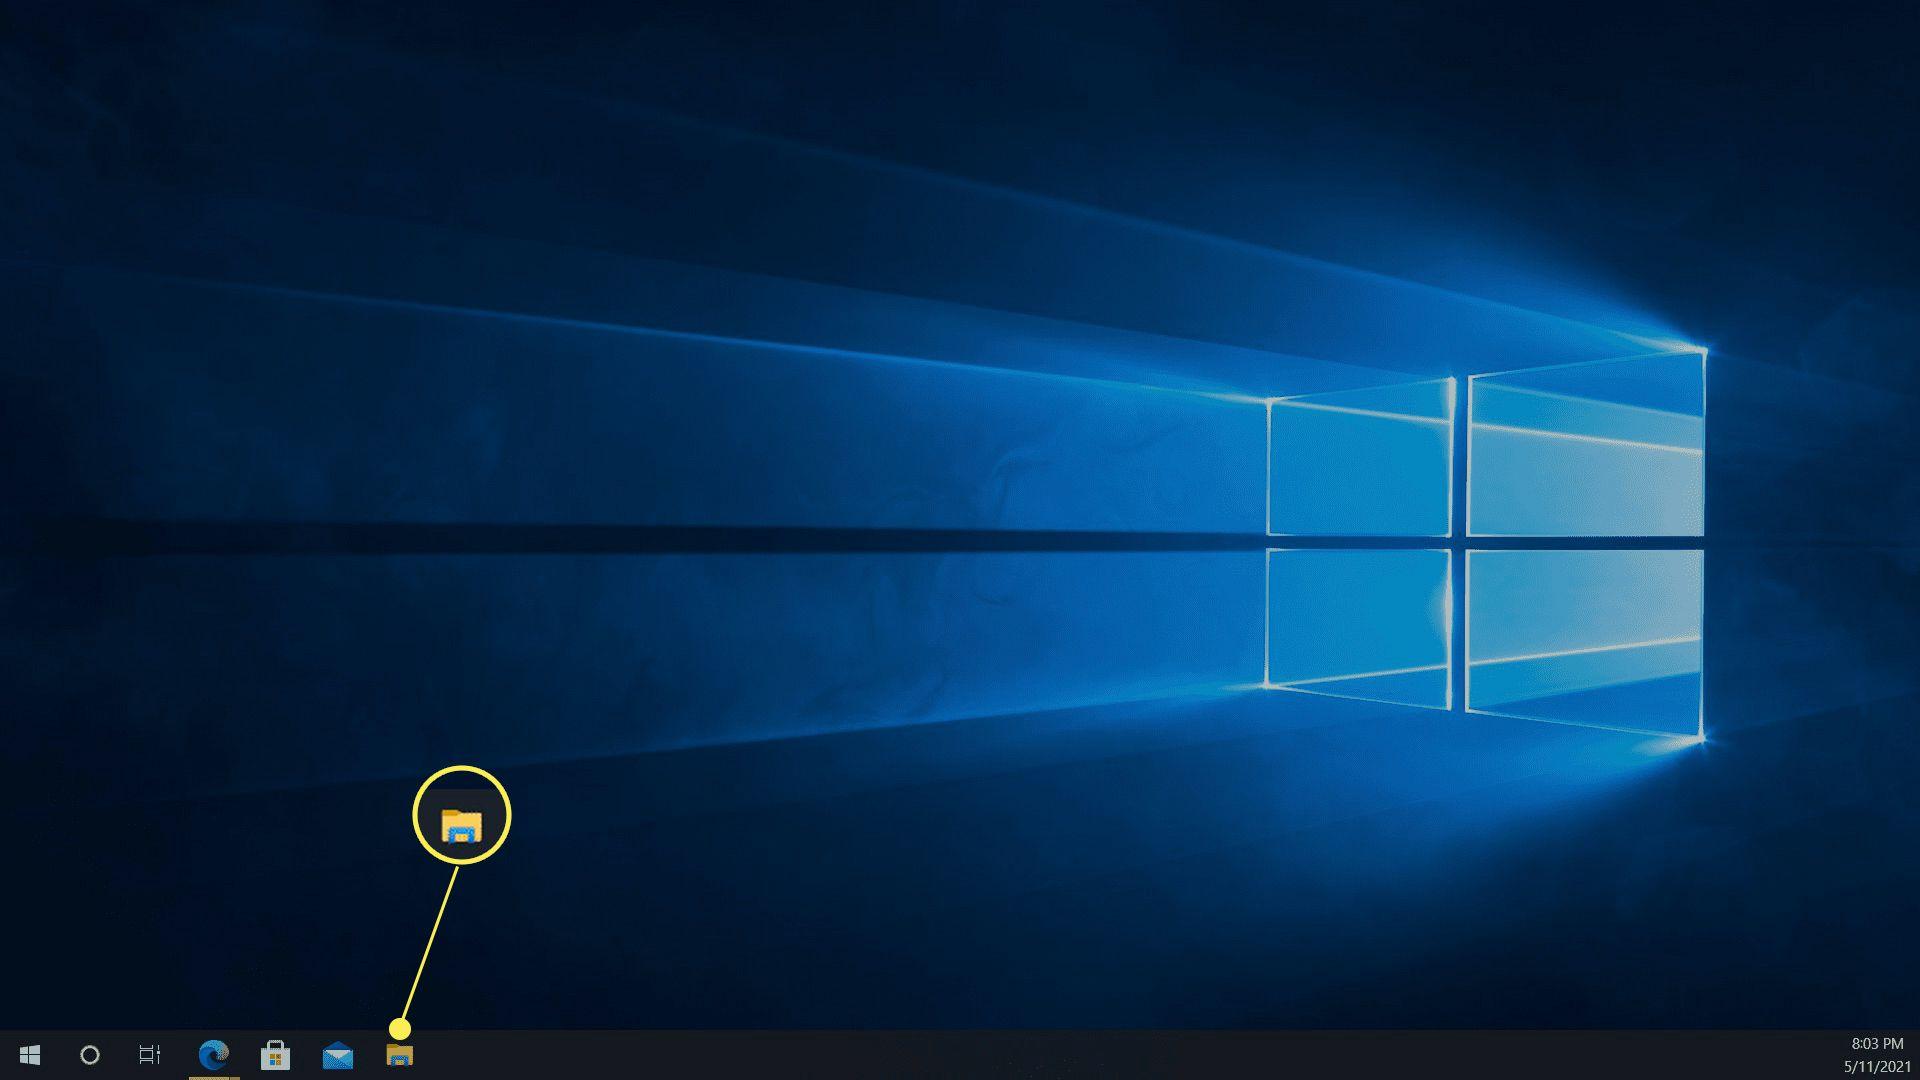 The File Explorer shortcut highlighted on the Windows 10 taskbar.